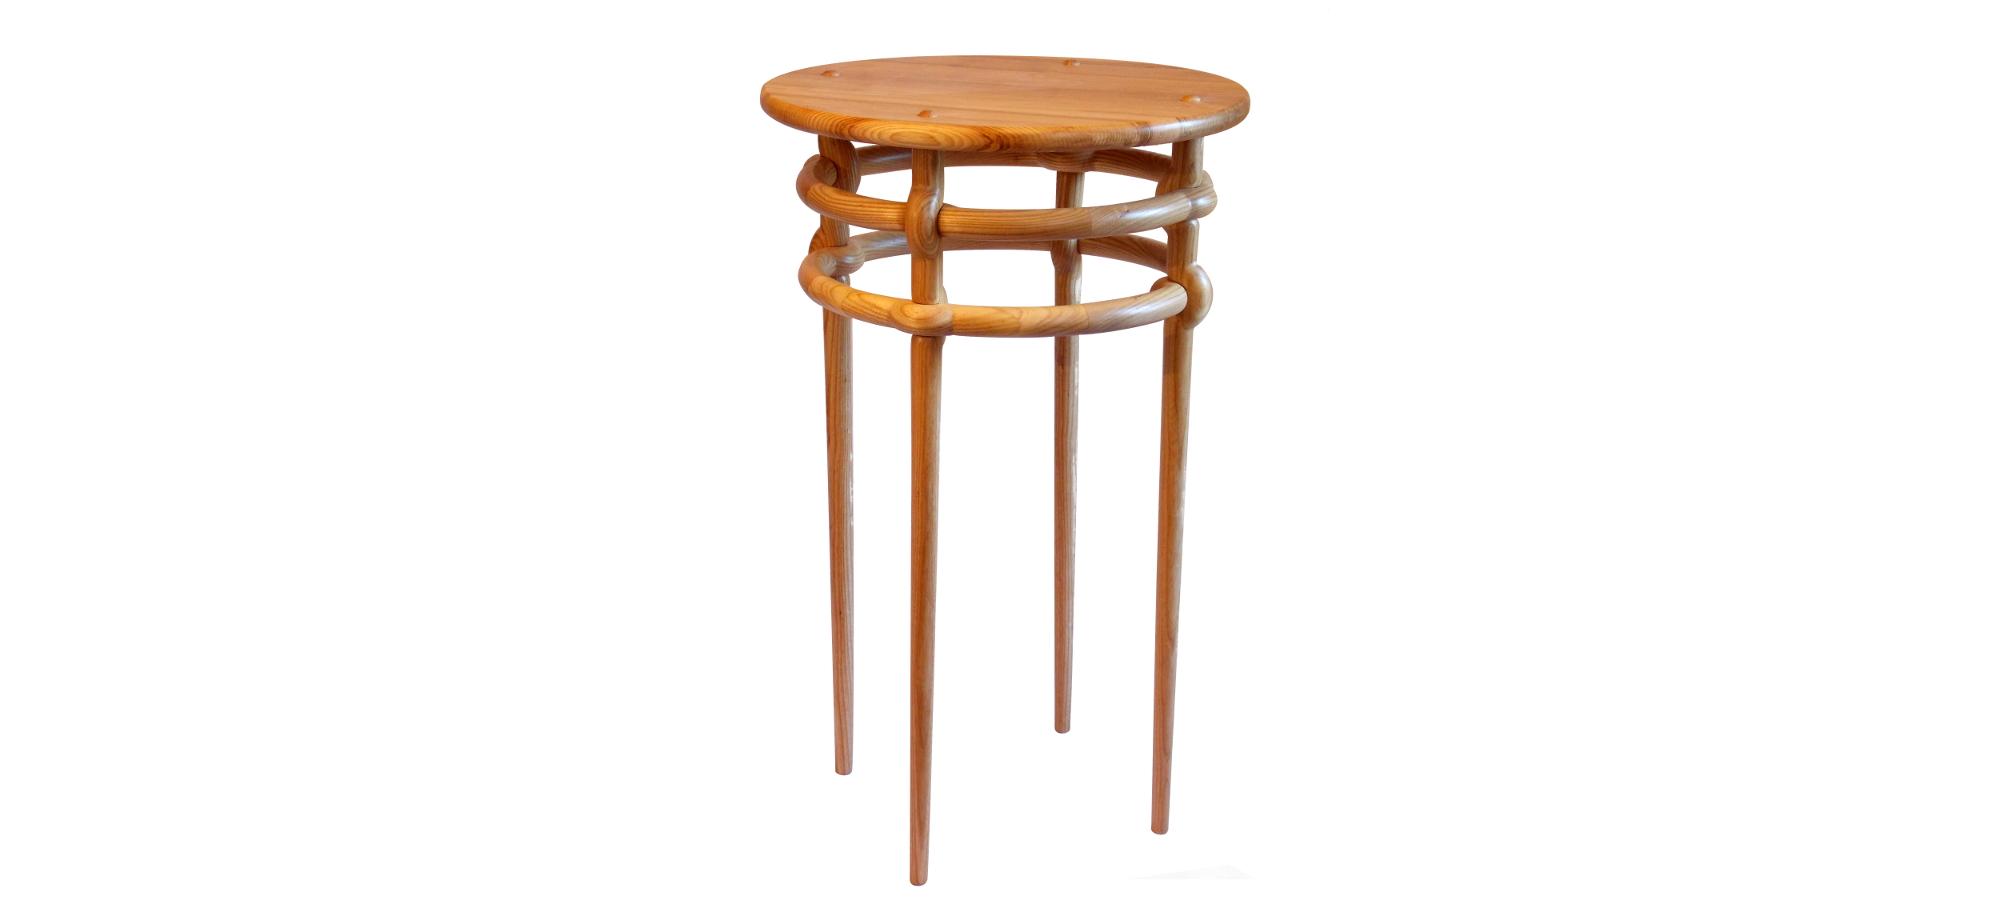 Weave Table in ash. Designer: Aaron Moore